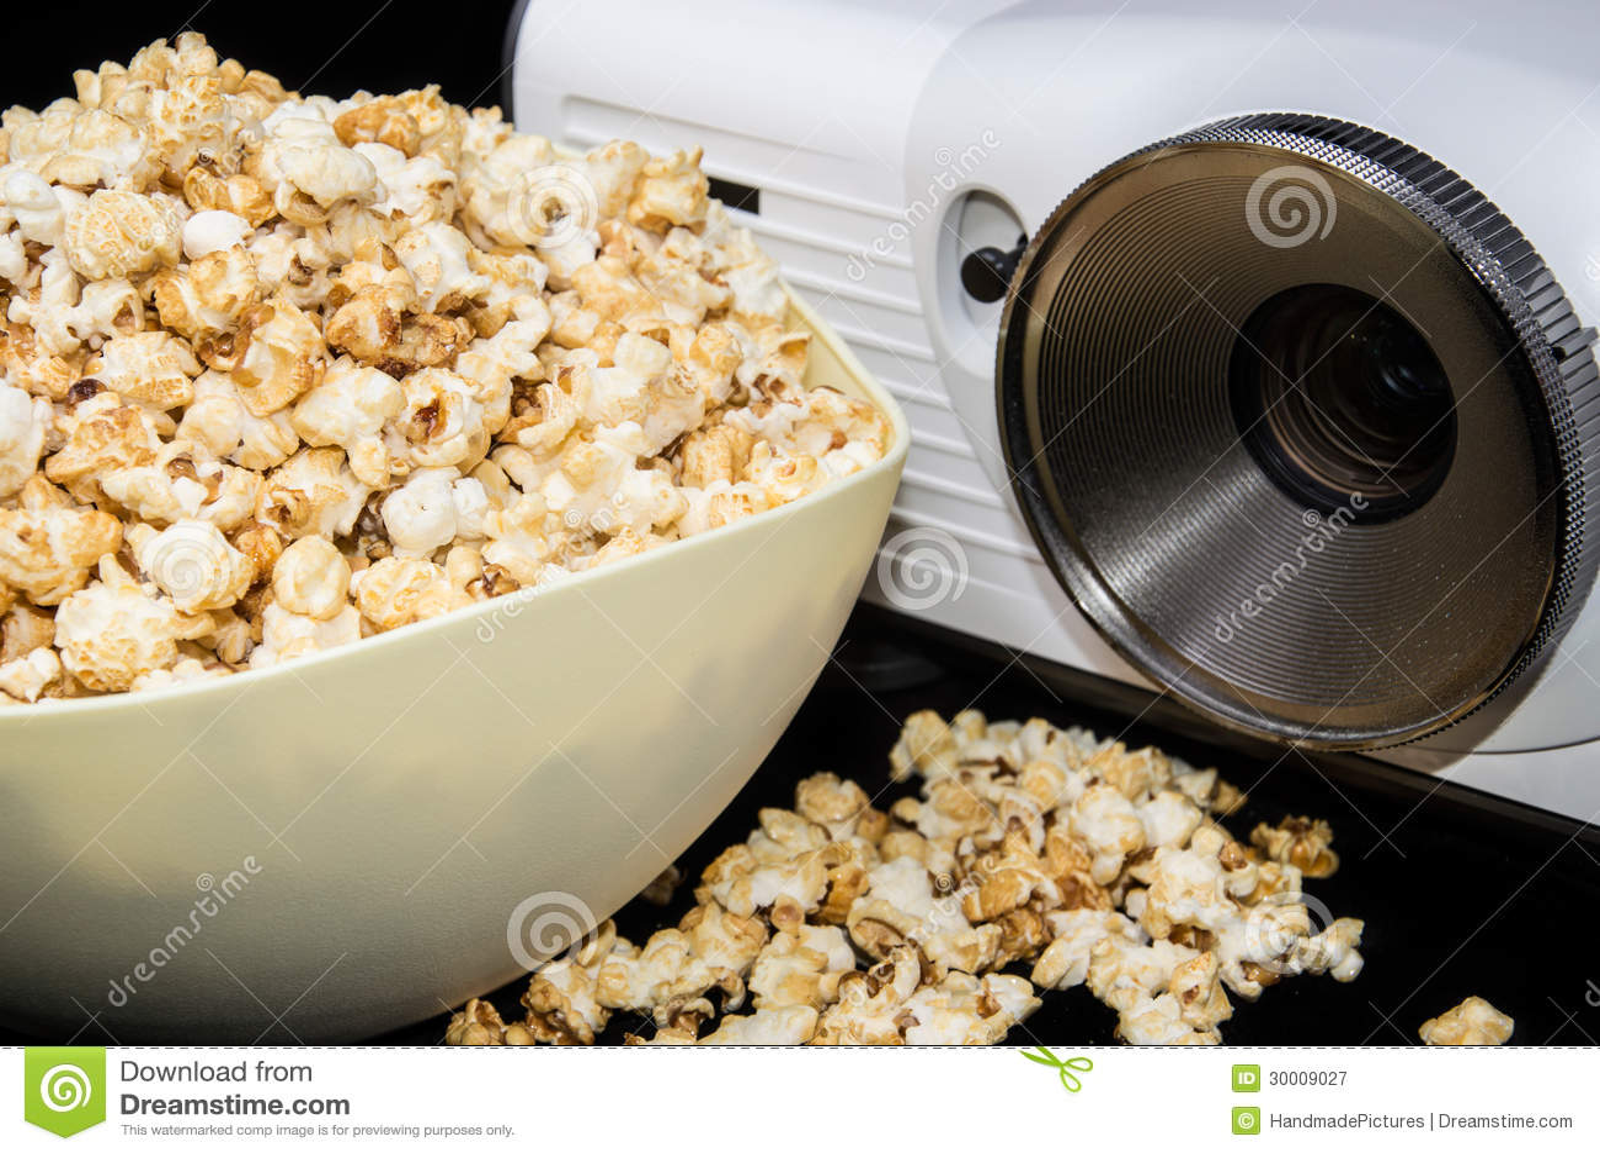 Home Cinema Equipment